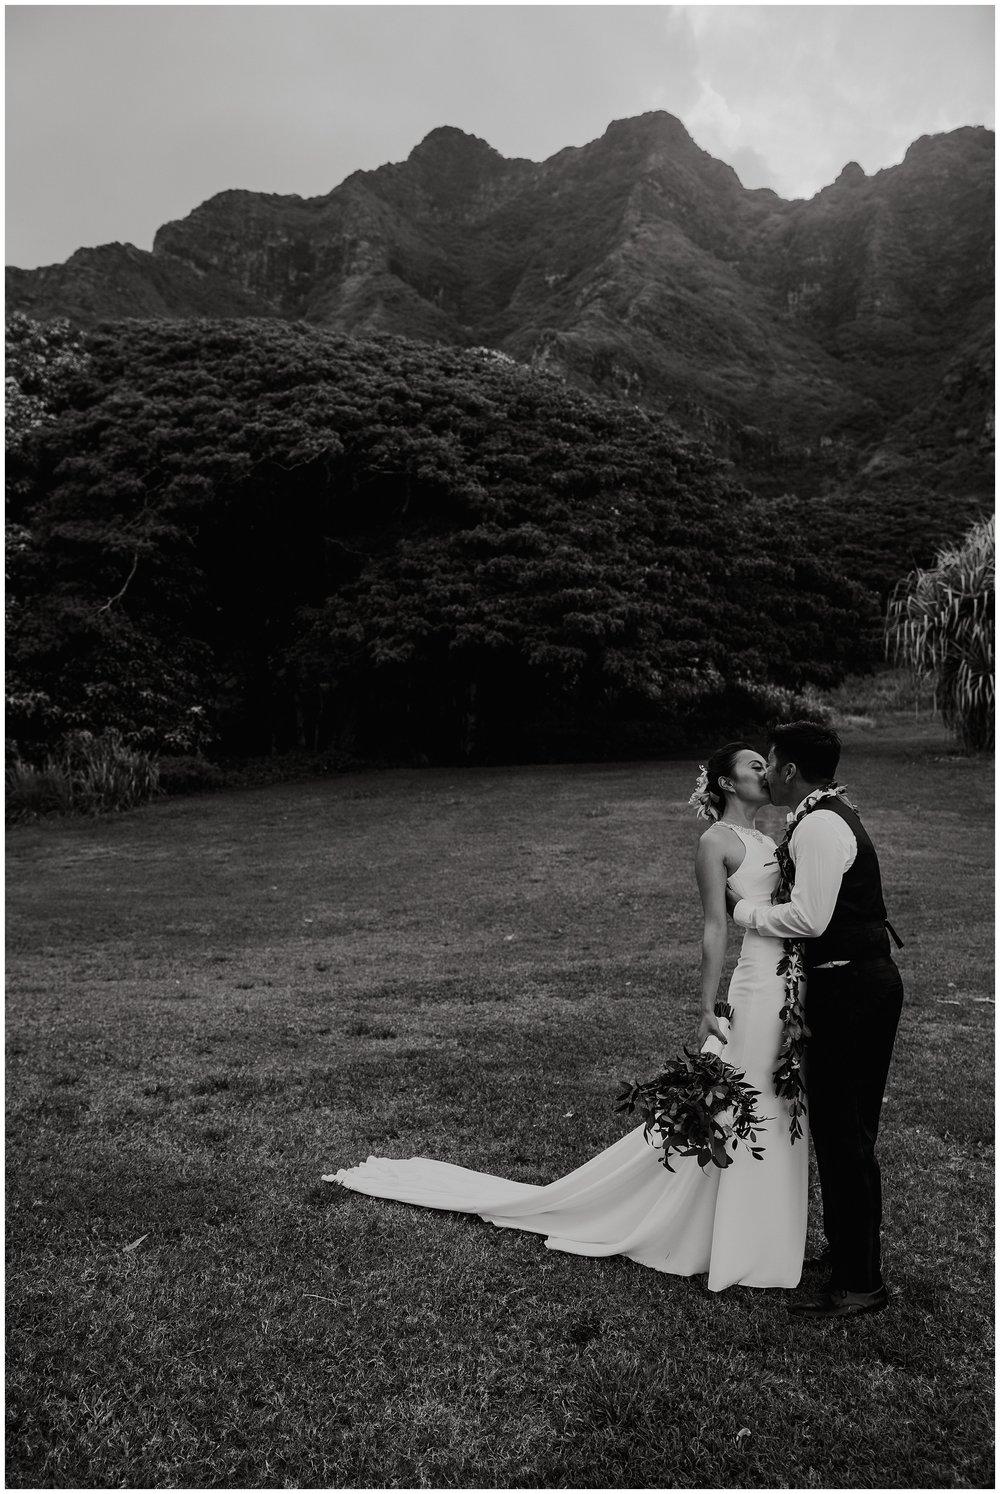 kualoa_ranch_wedding10.jpg